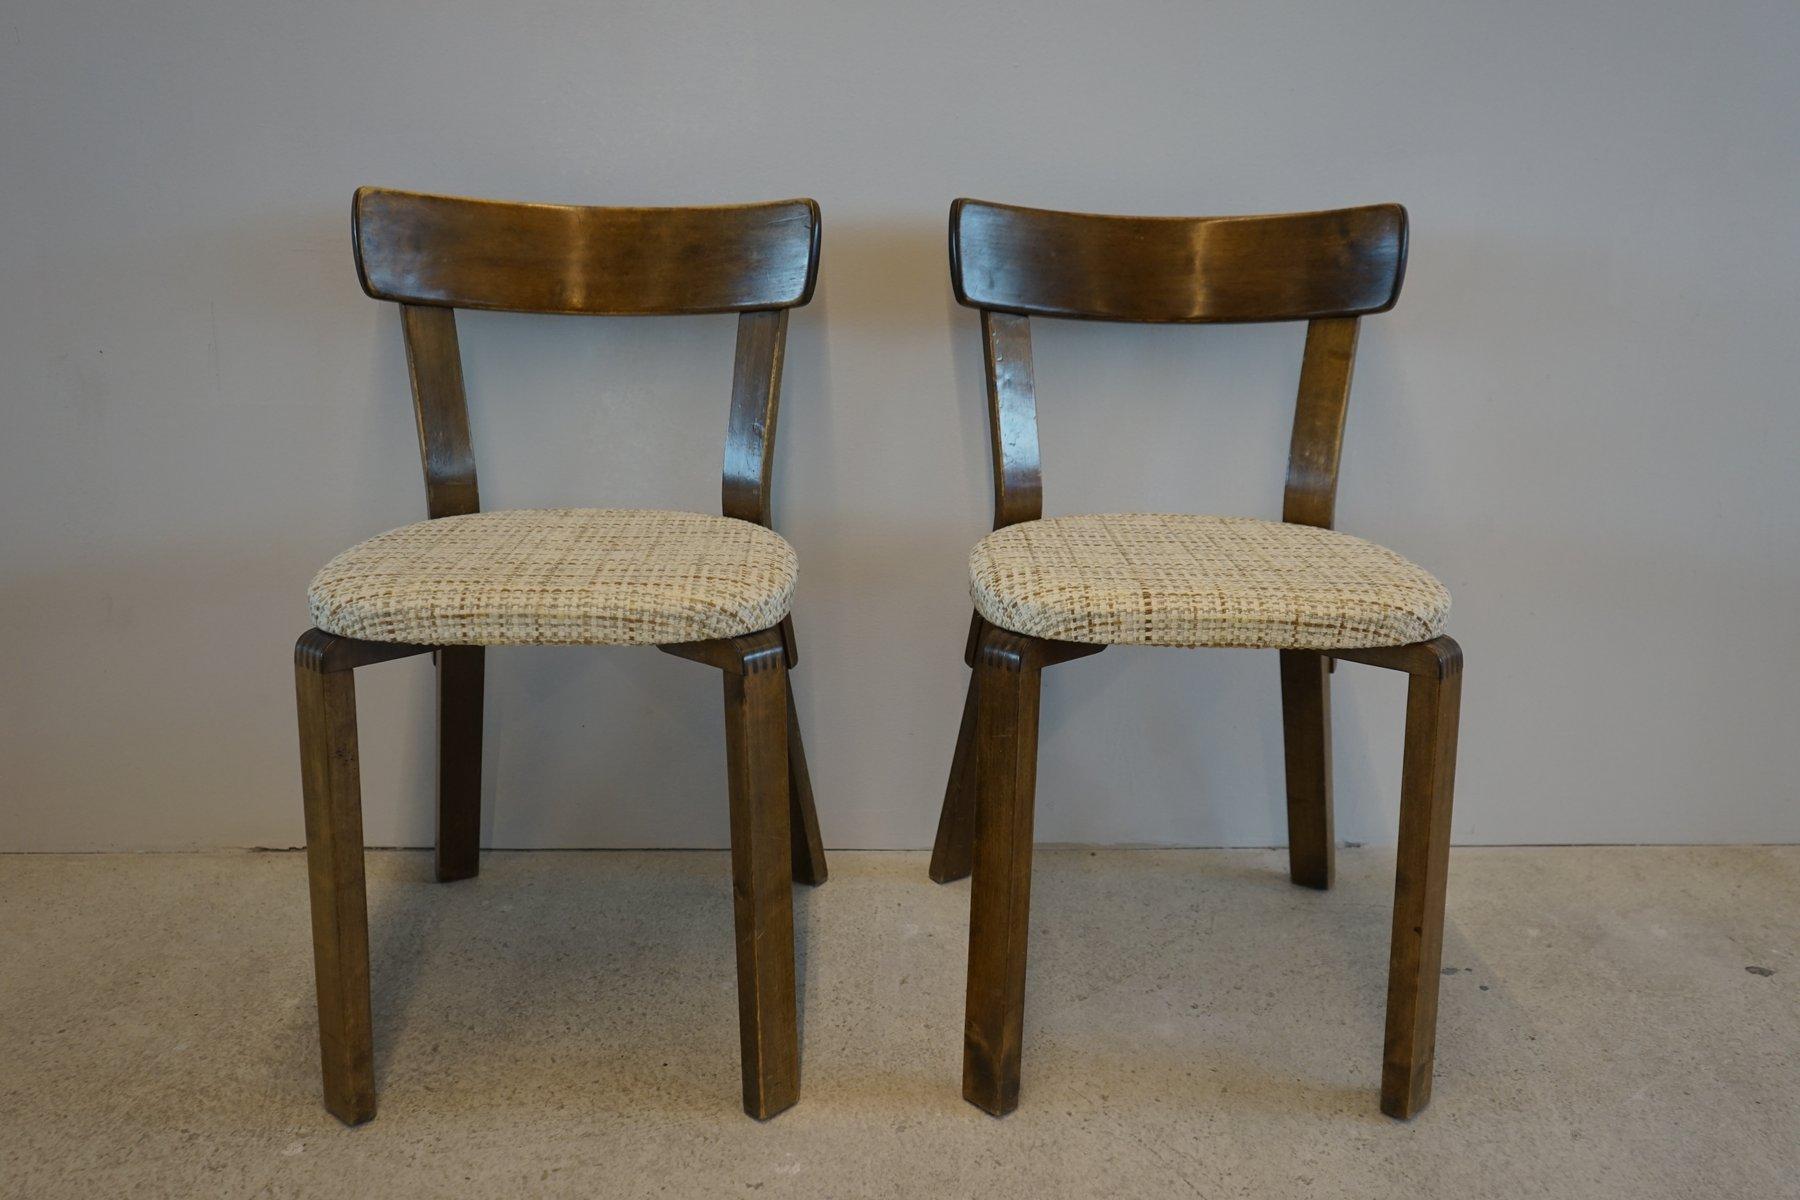 Prewar Chair 69 by Alvar Aalto for Artek 1940s for sale at Pamono